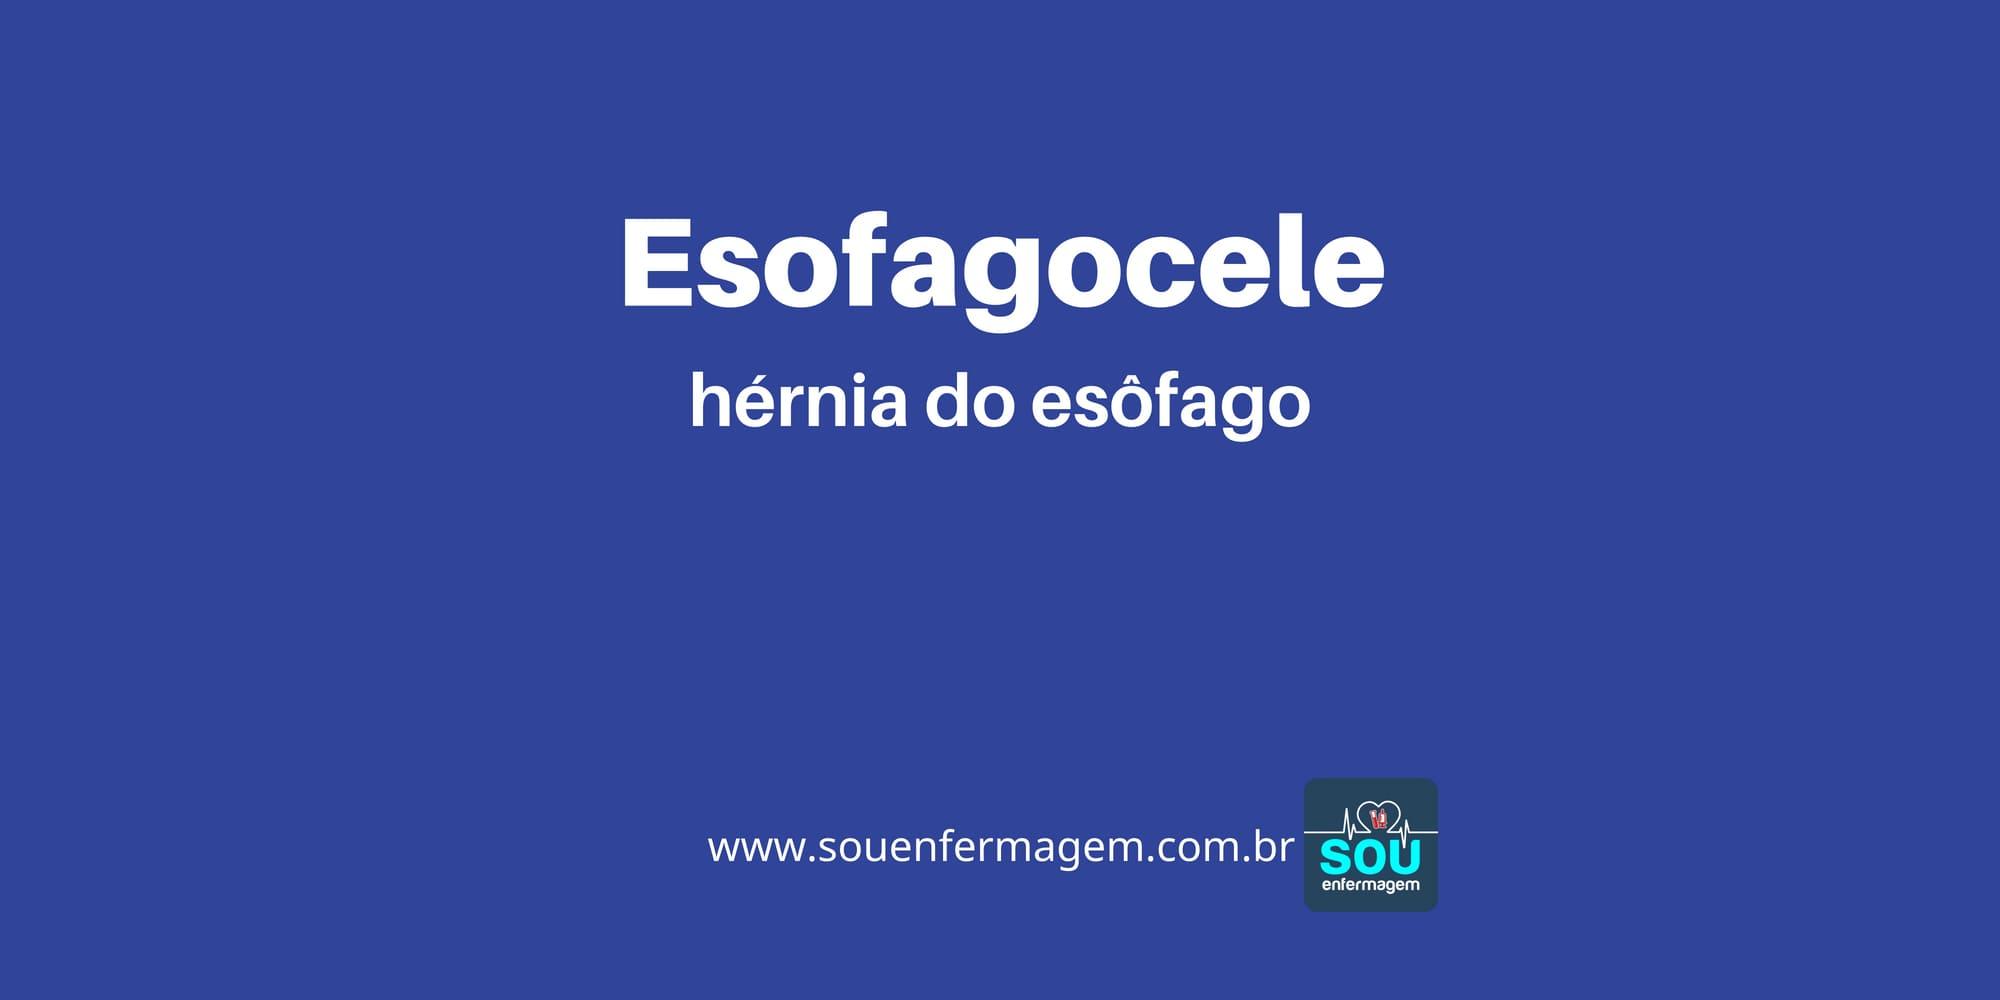 Esofagocele